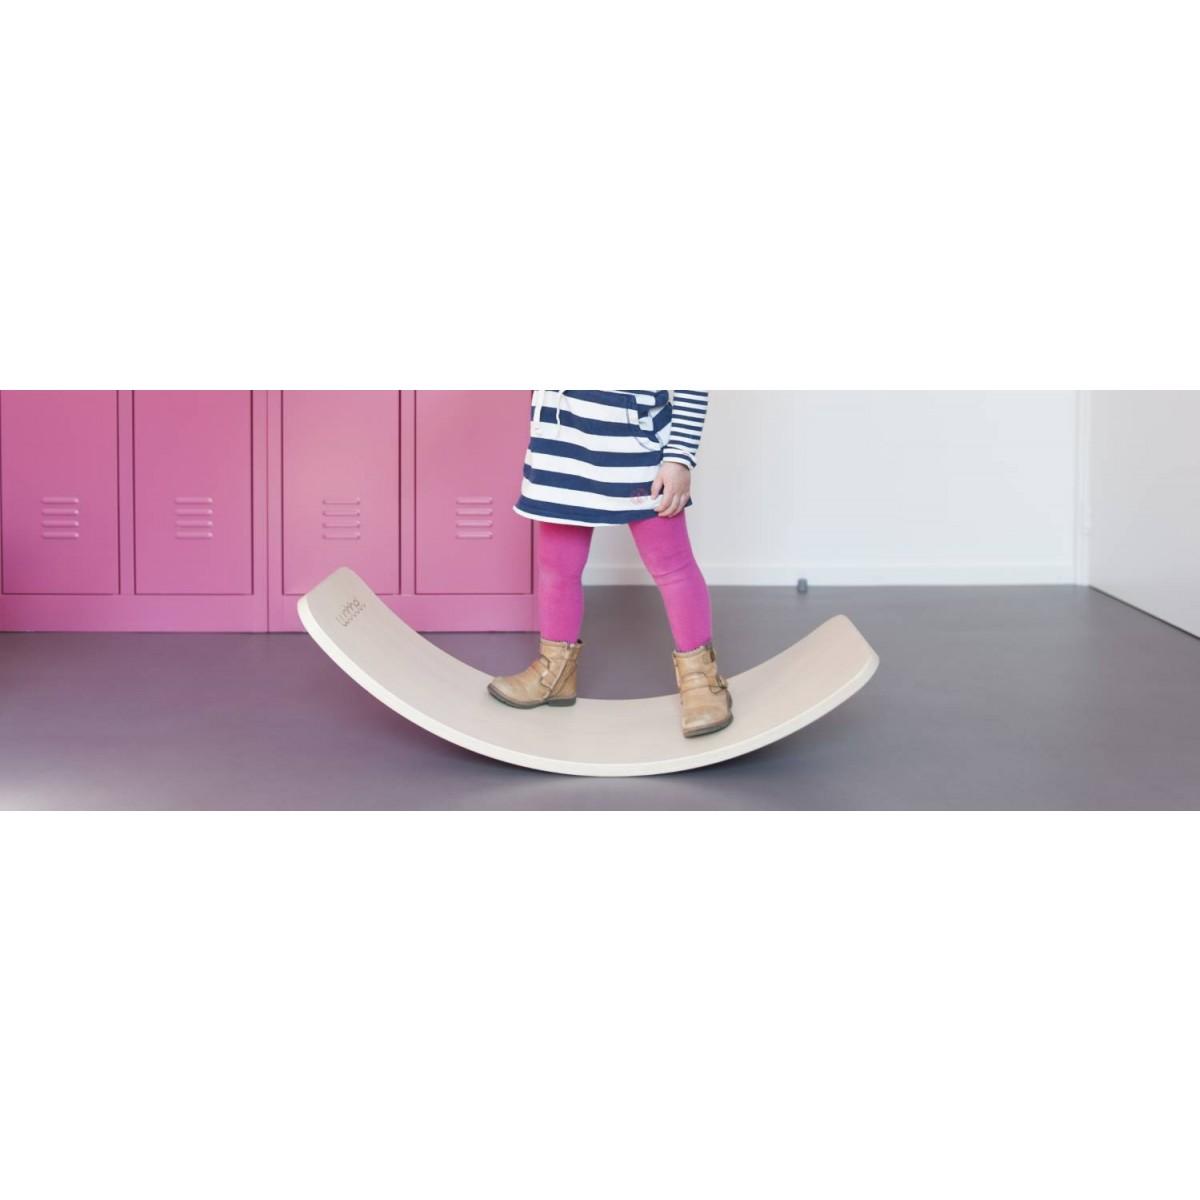 wobbel board in natur lackiert beim holzspielzeug profi. Black Bedroom Furniture Sets. Home Design Ideas